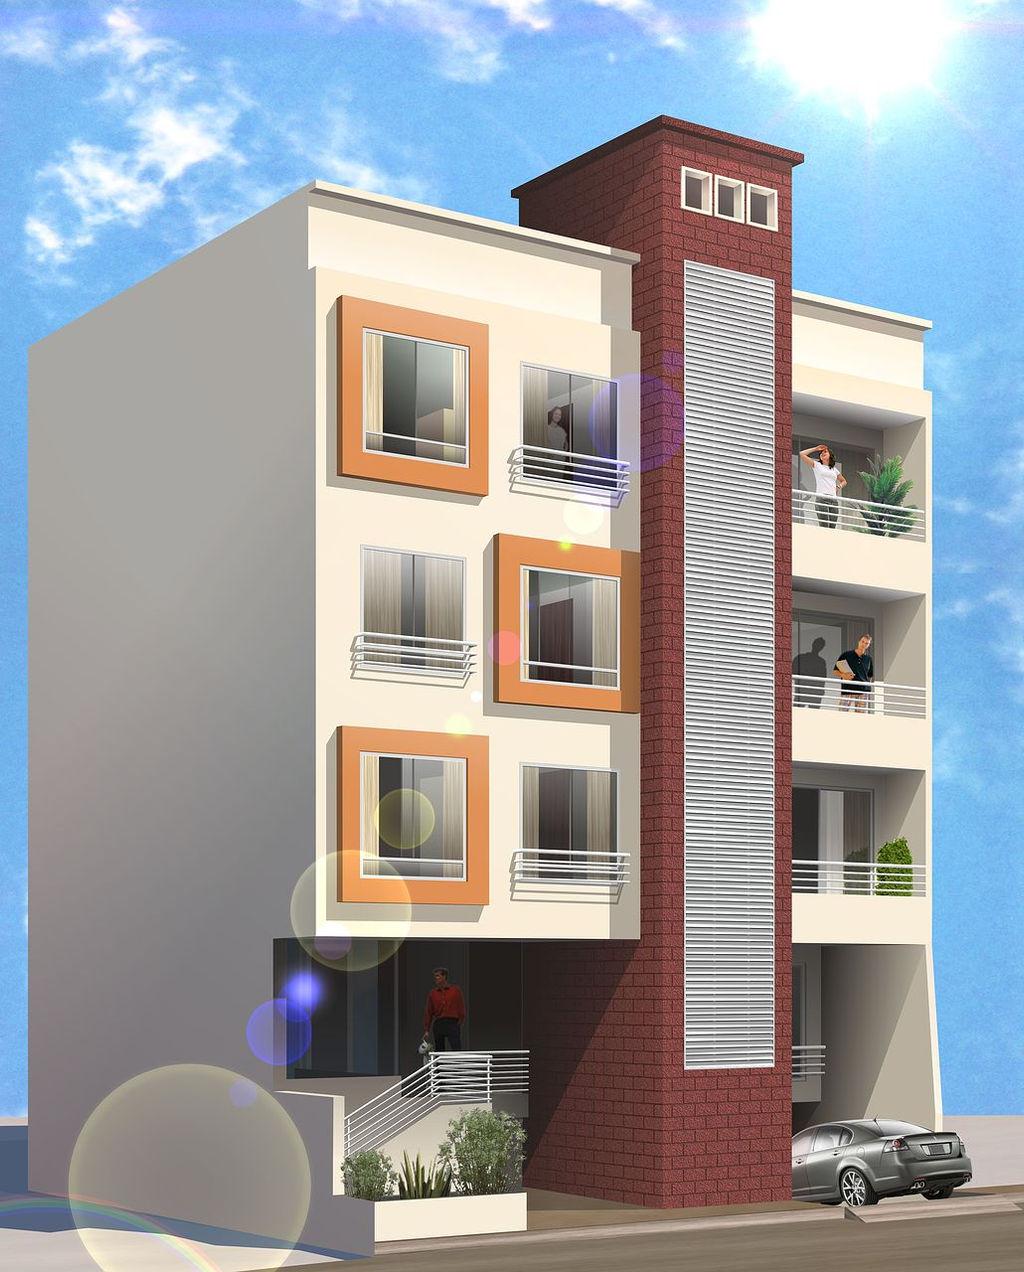 Edificio Sanalejo Apartamentos Barrancabermeja